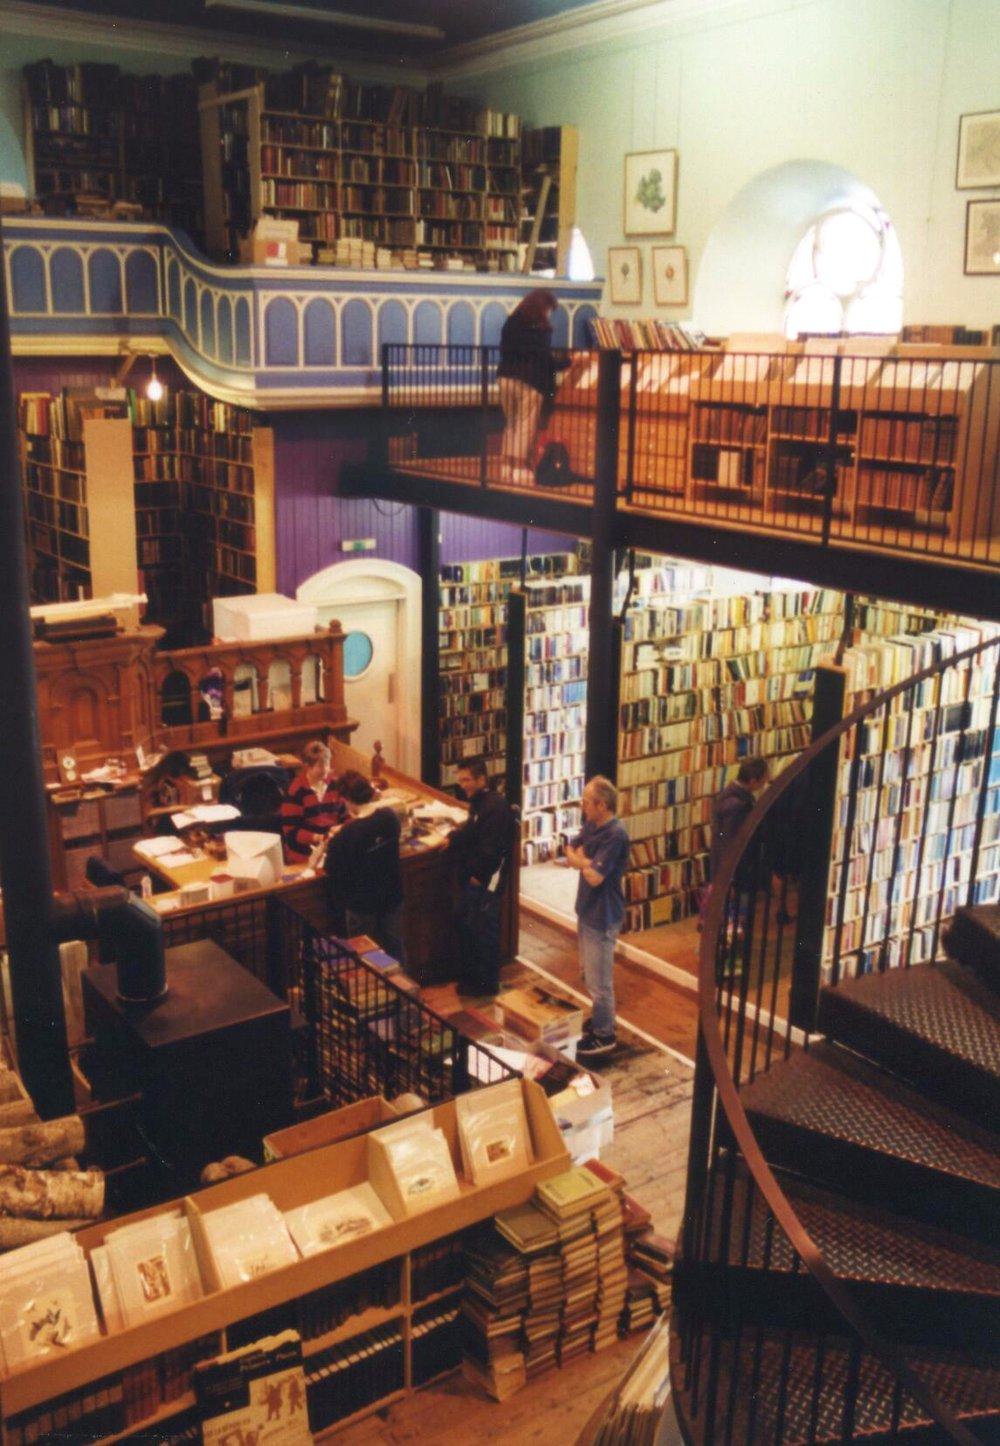 Leakey's magical second-hand bookshop